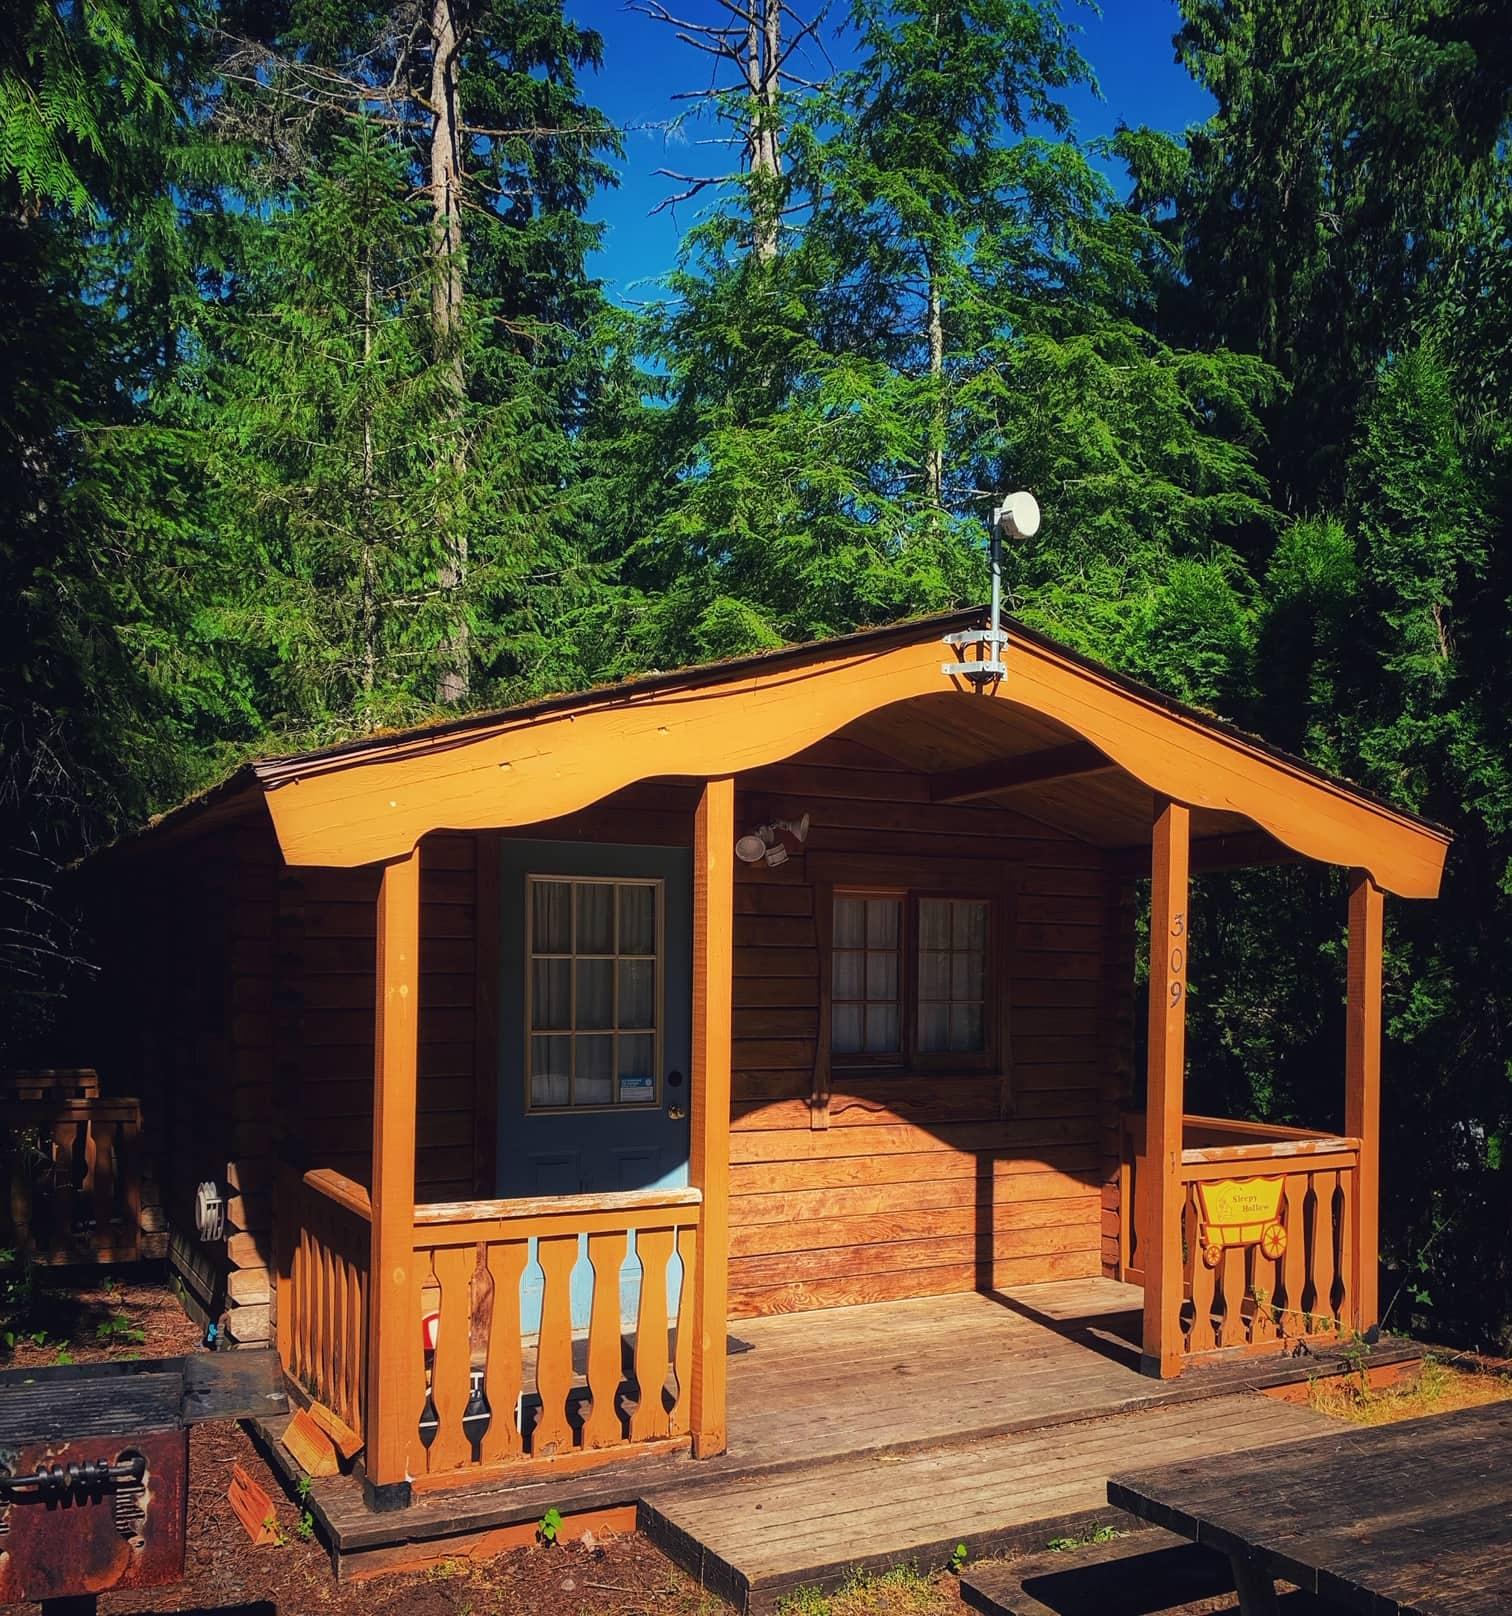 Rustic Cabins at Mt Hood Village RV Resort